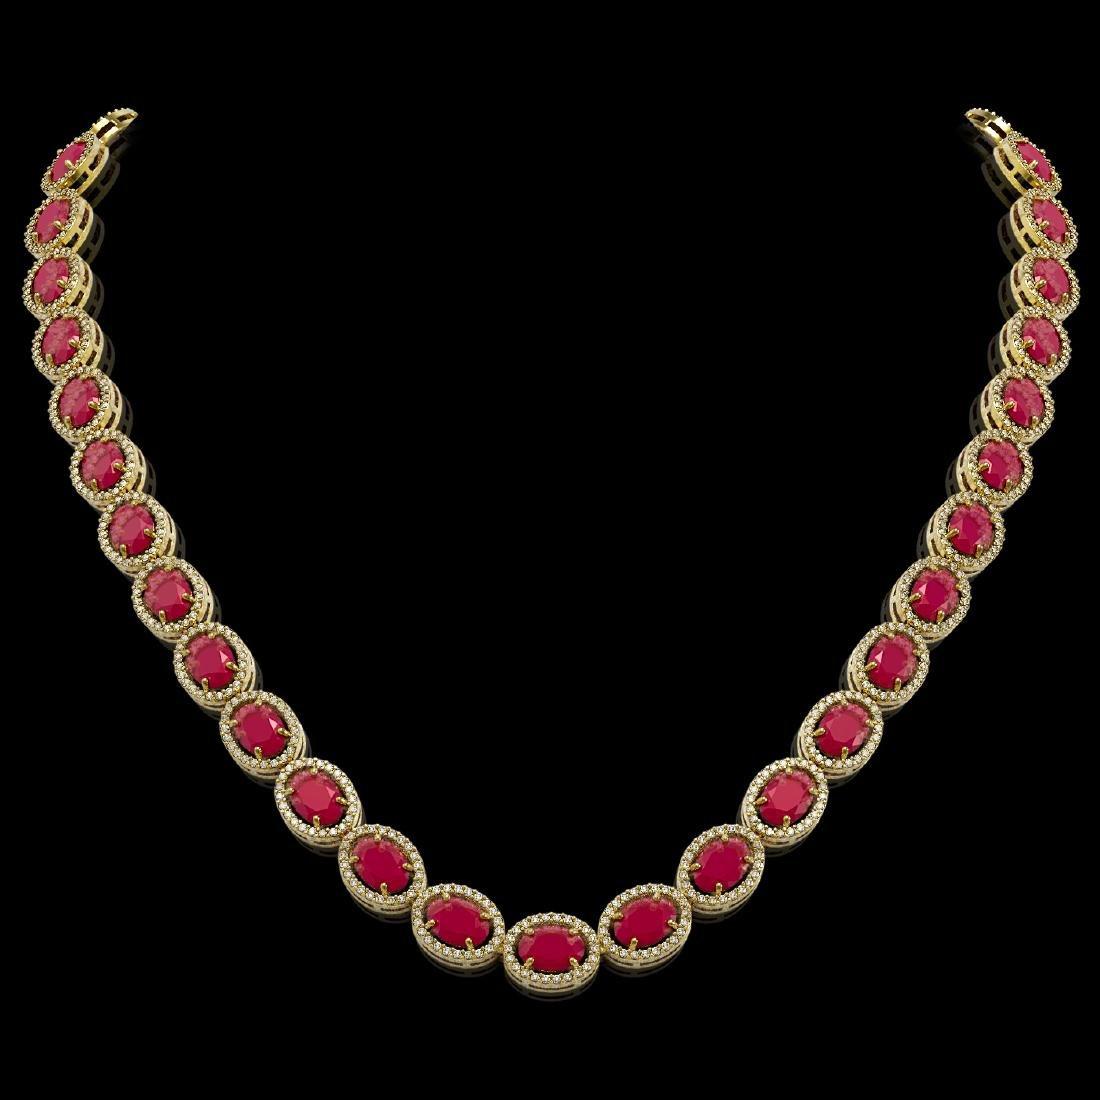 52.15 CTW Ruby & Diamond Halo Necklace 10K Yellow Gold